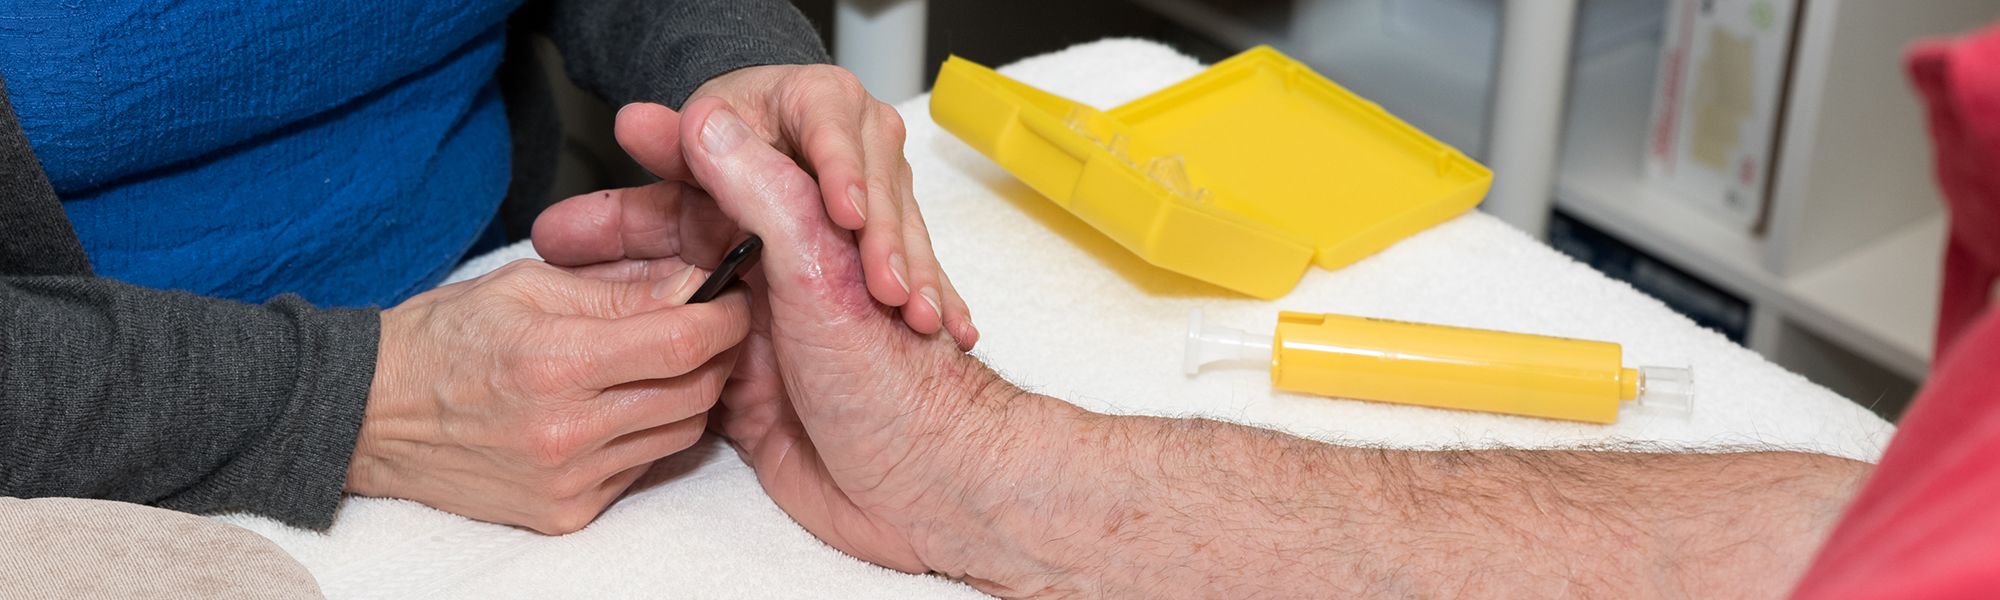 Gresham Armworks Hand Therapy